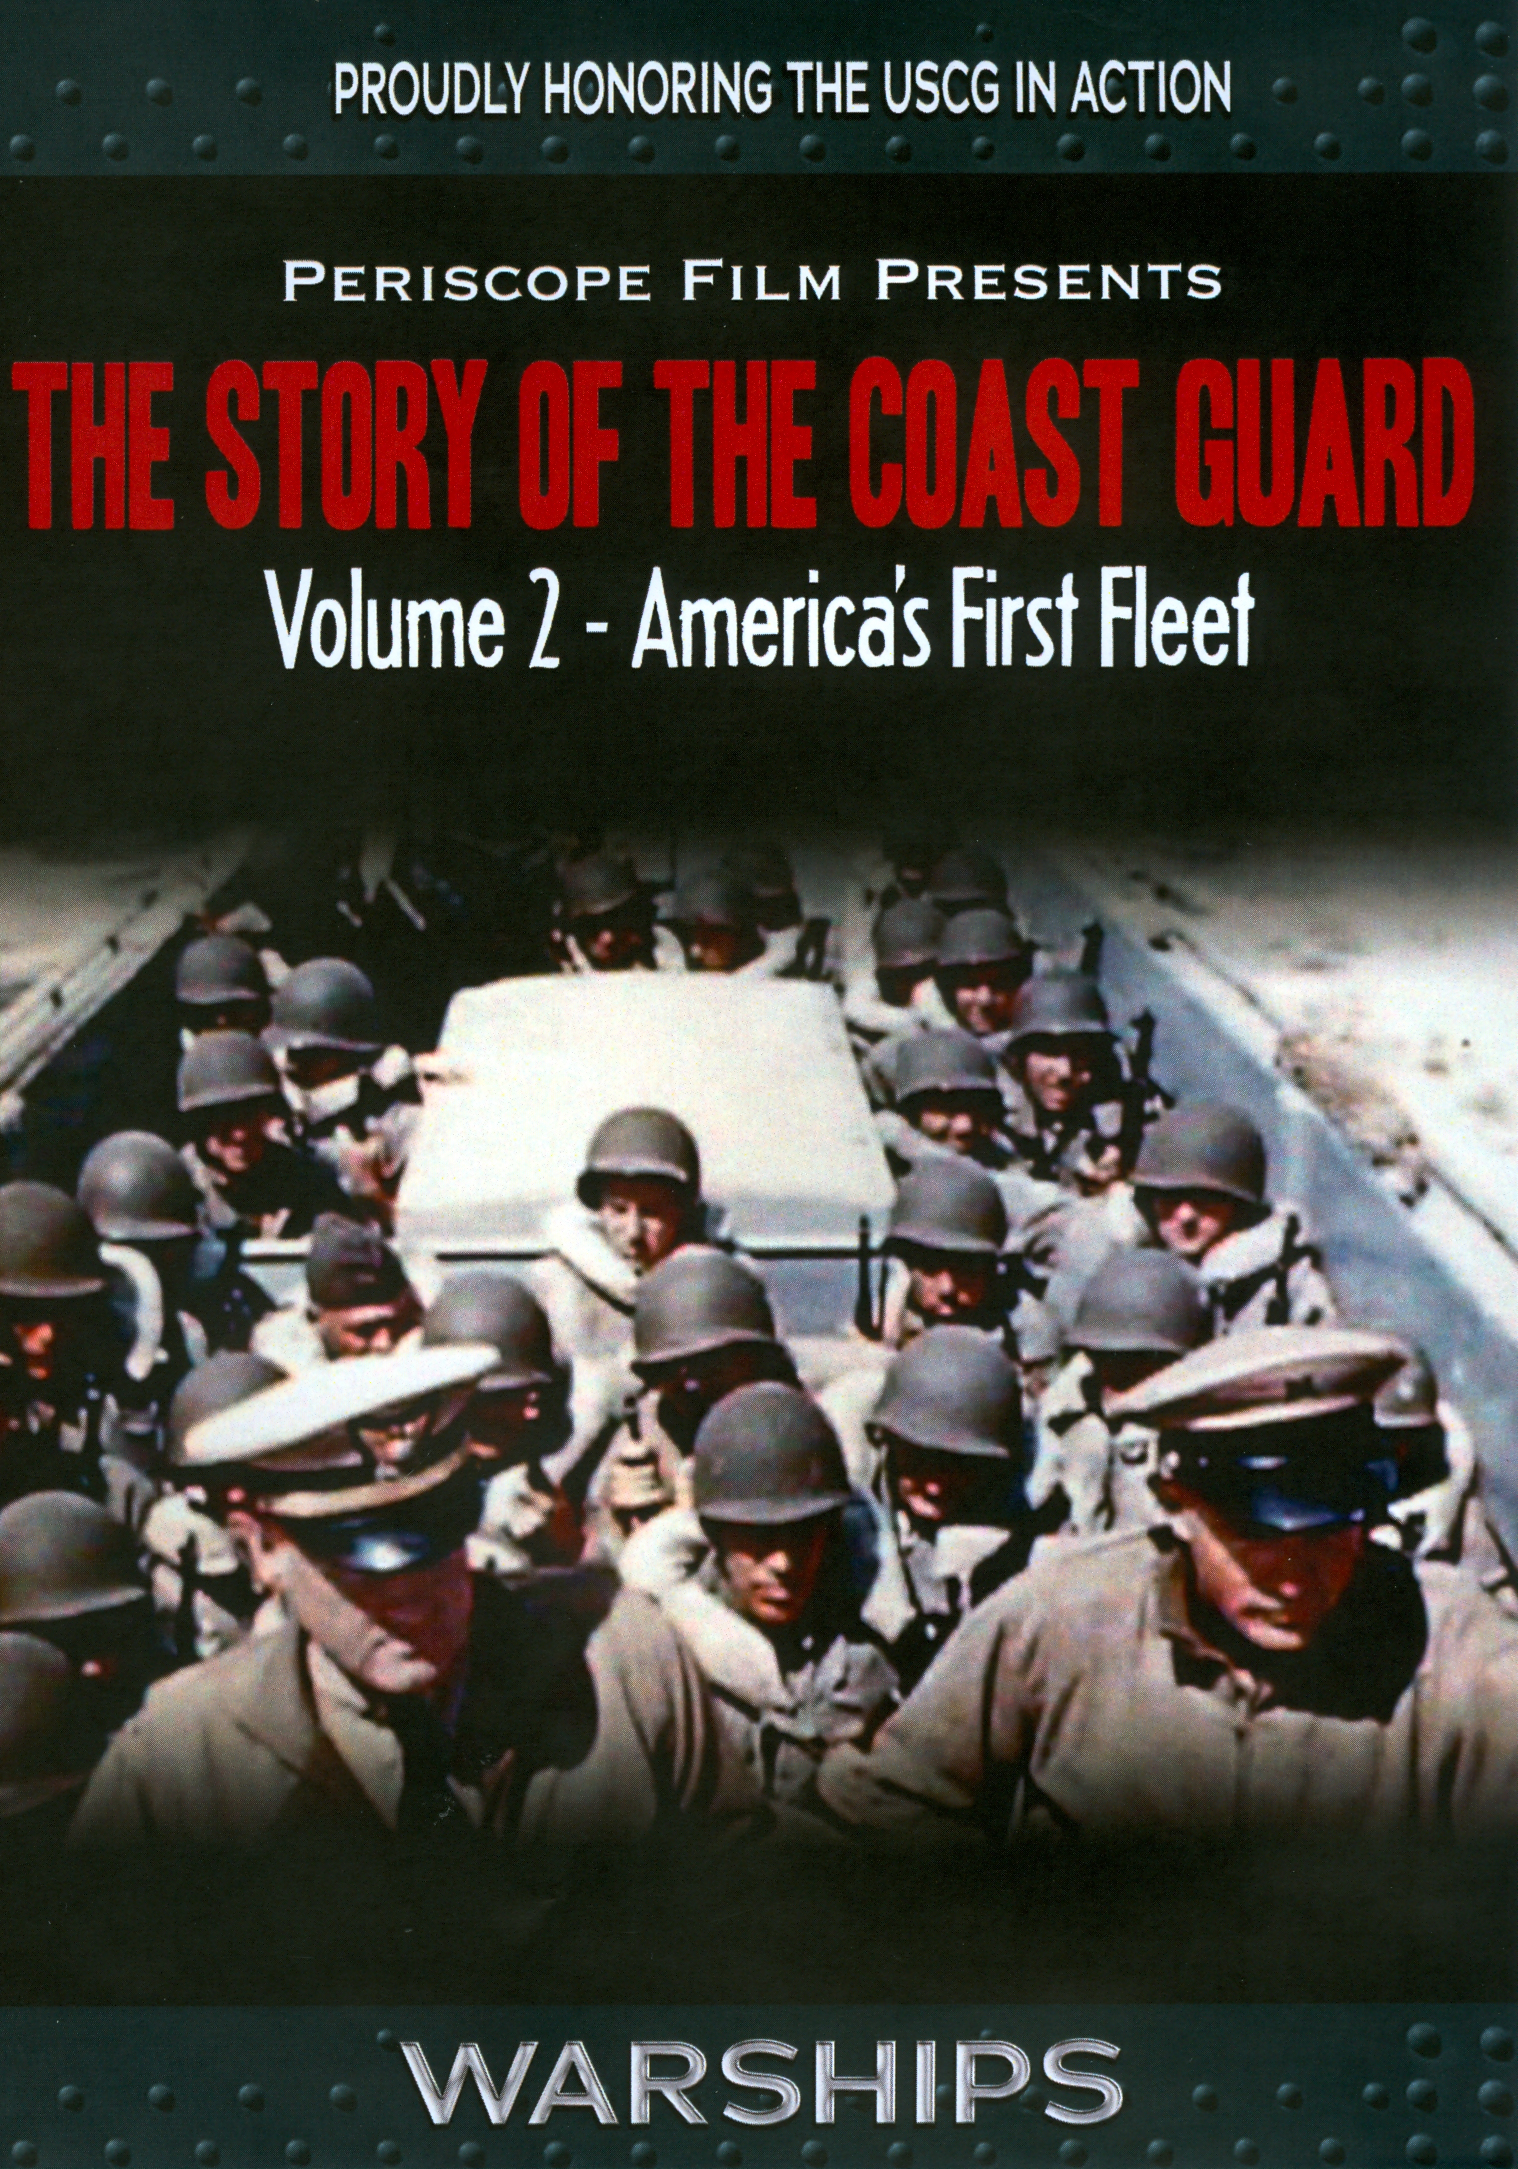 Story of the Coast Guard, Vol. 2: America's First Fleet